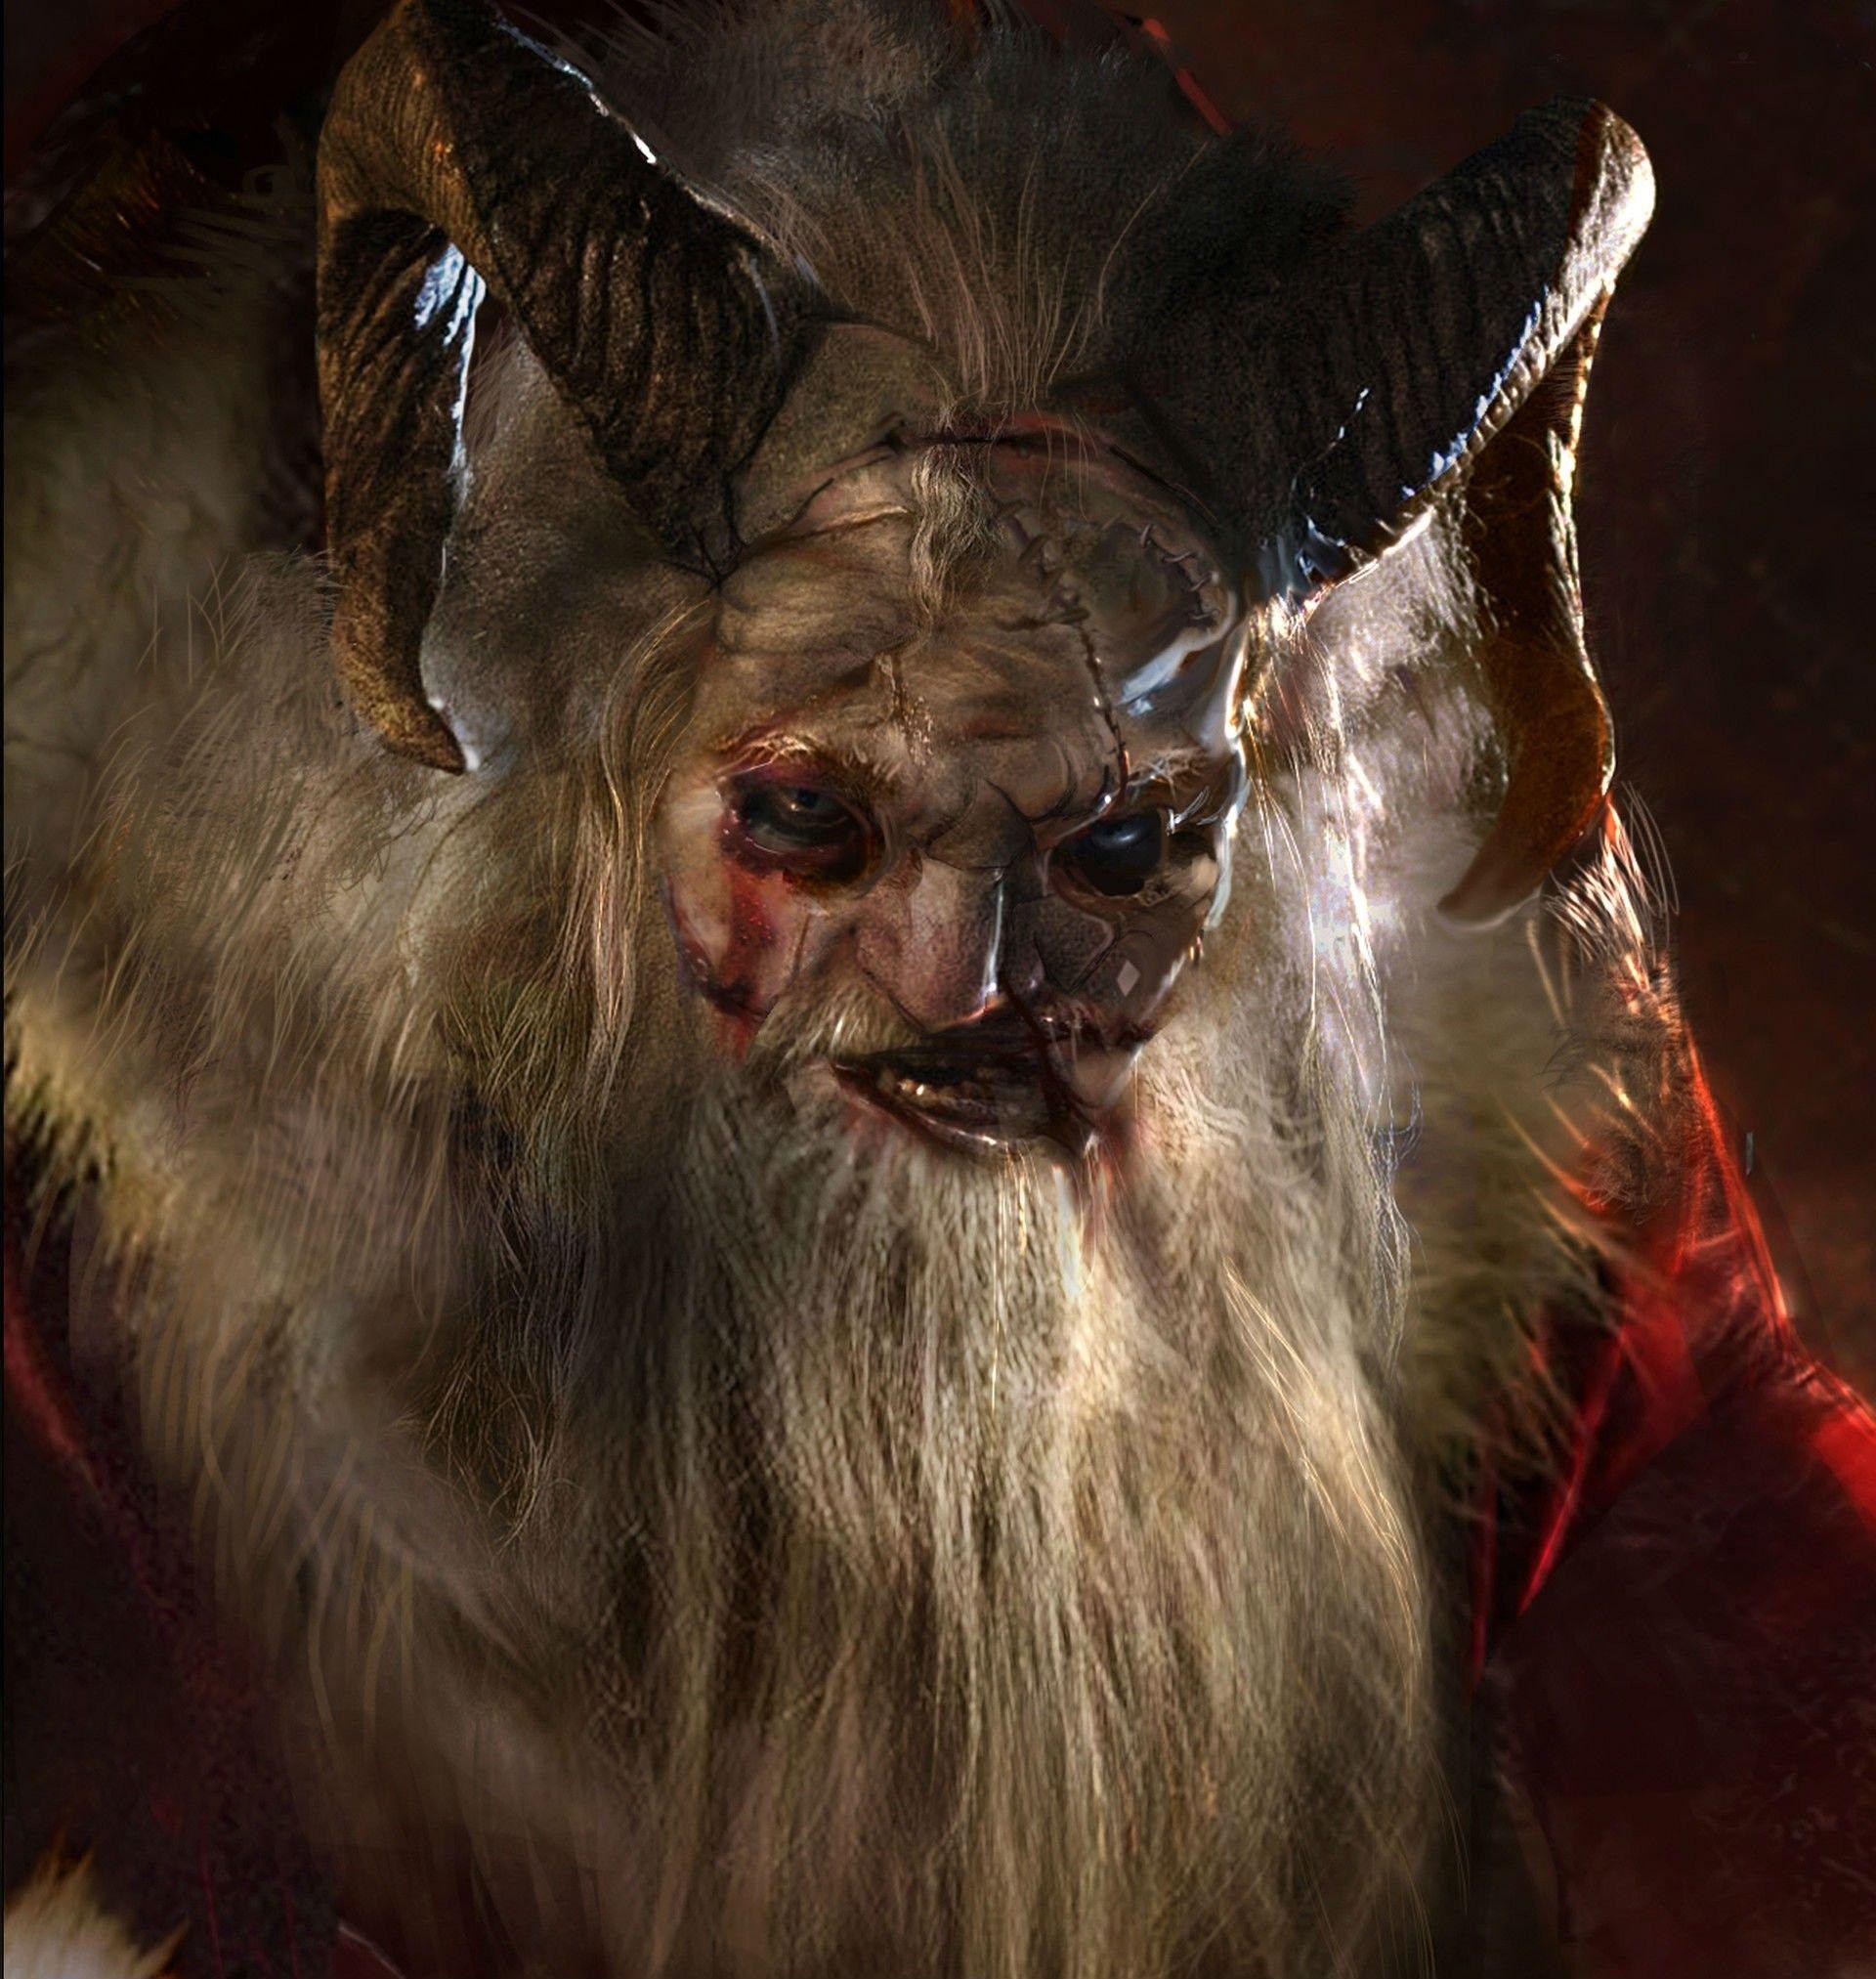 Res 1920x2025 Horror Demon Occult Christmas Monster Dark Darknes Wallpapers Windows Desktop Images Hd Vectors Krampus Movie Krampus Christmas Horror